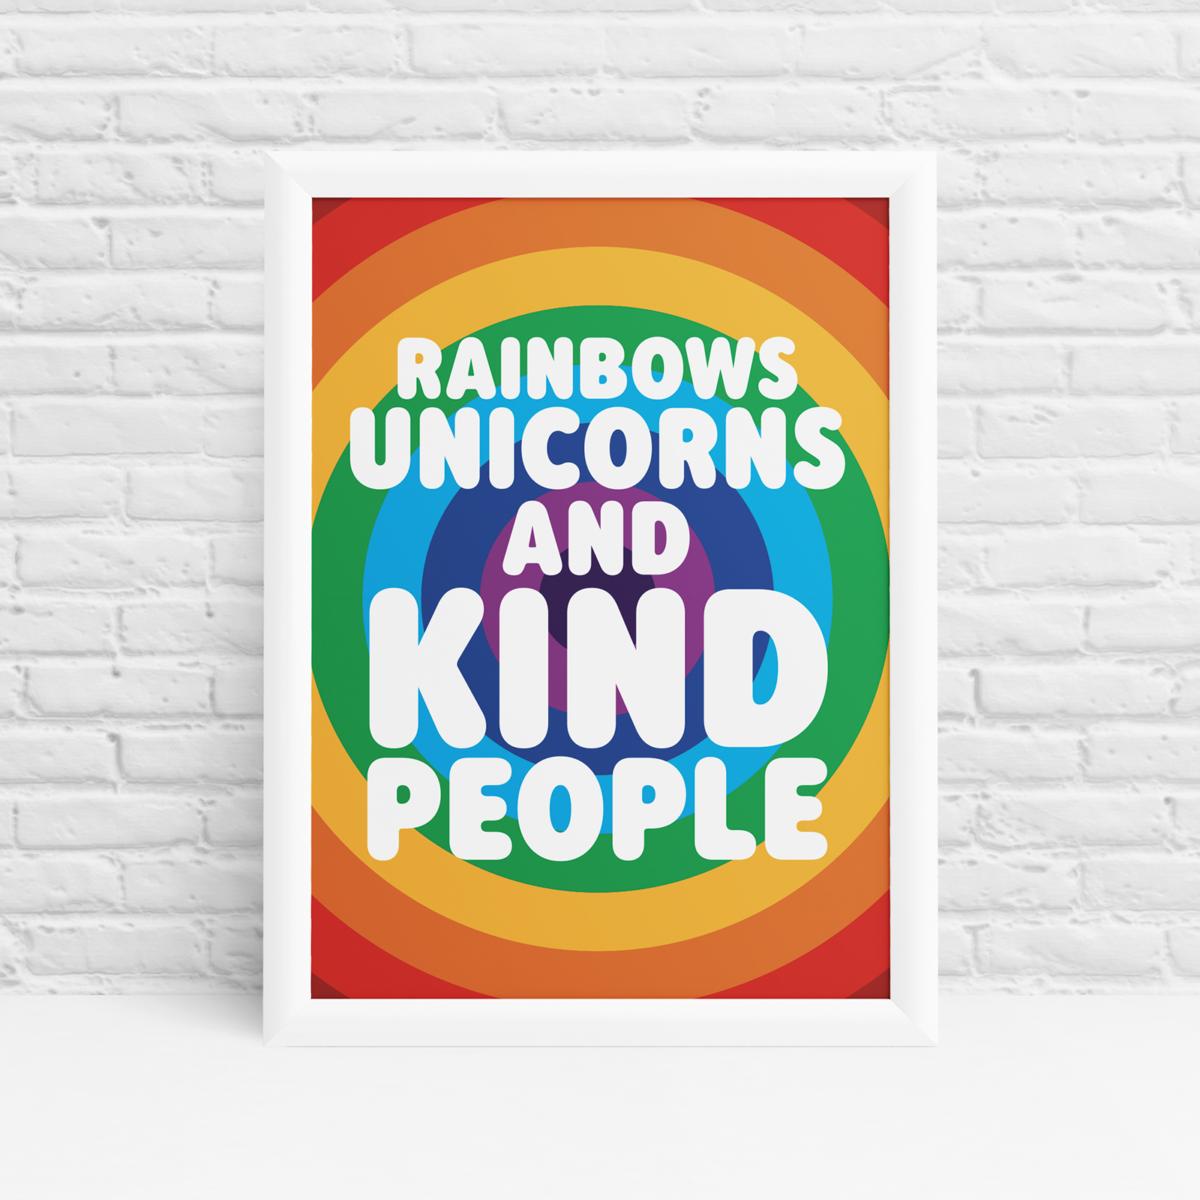 Rainbows, Unicorns and Kind People Poster